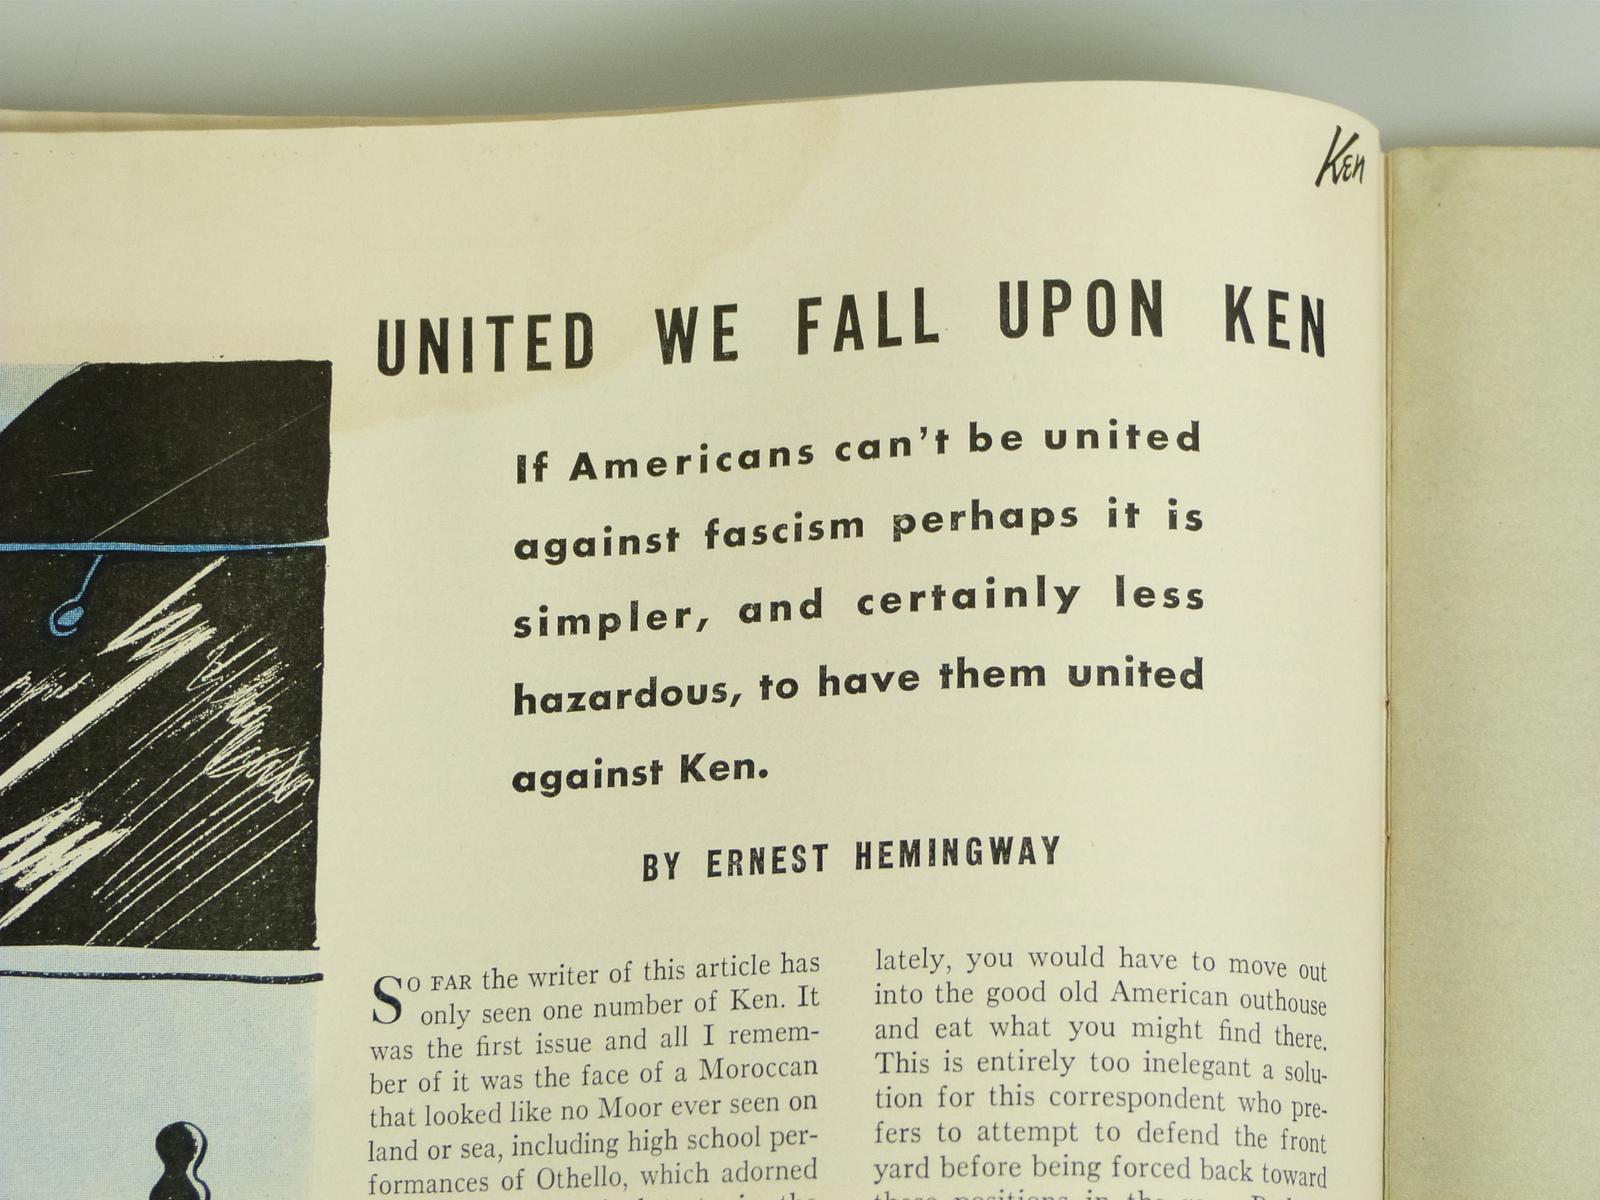 "Ernest Hemingway ""United We Fall Upon Ken"", in Ken Magazine Vol 1 No 5 June 2, 1"